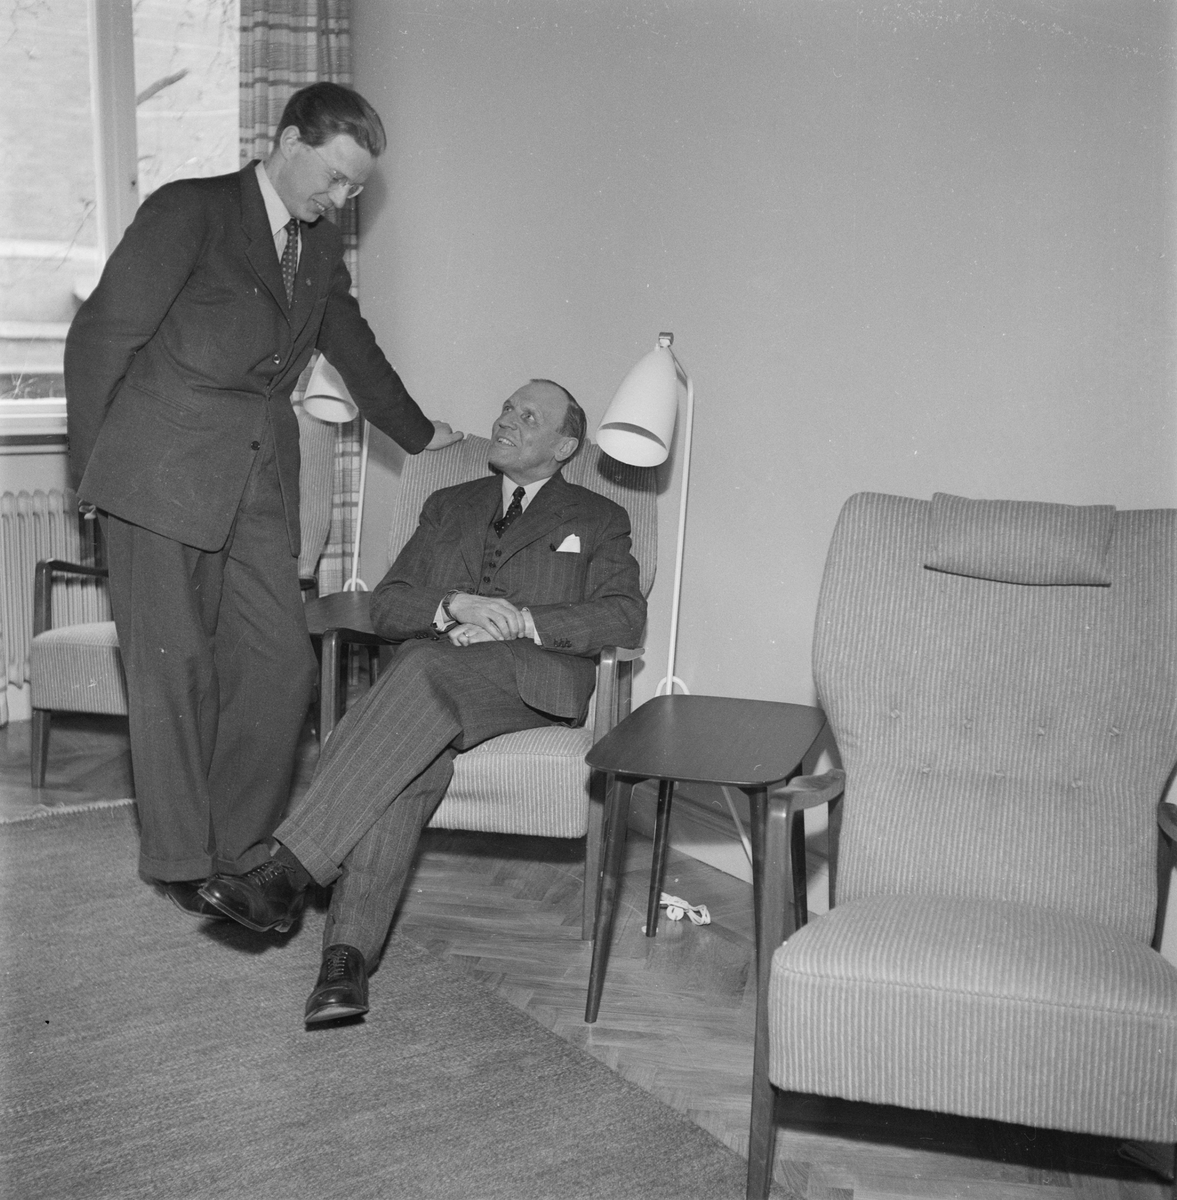 Gästrike-Hälsinge nation, nyrenovering, Uppsala, april 1952